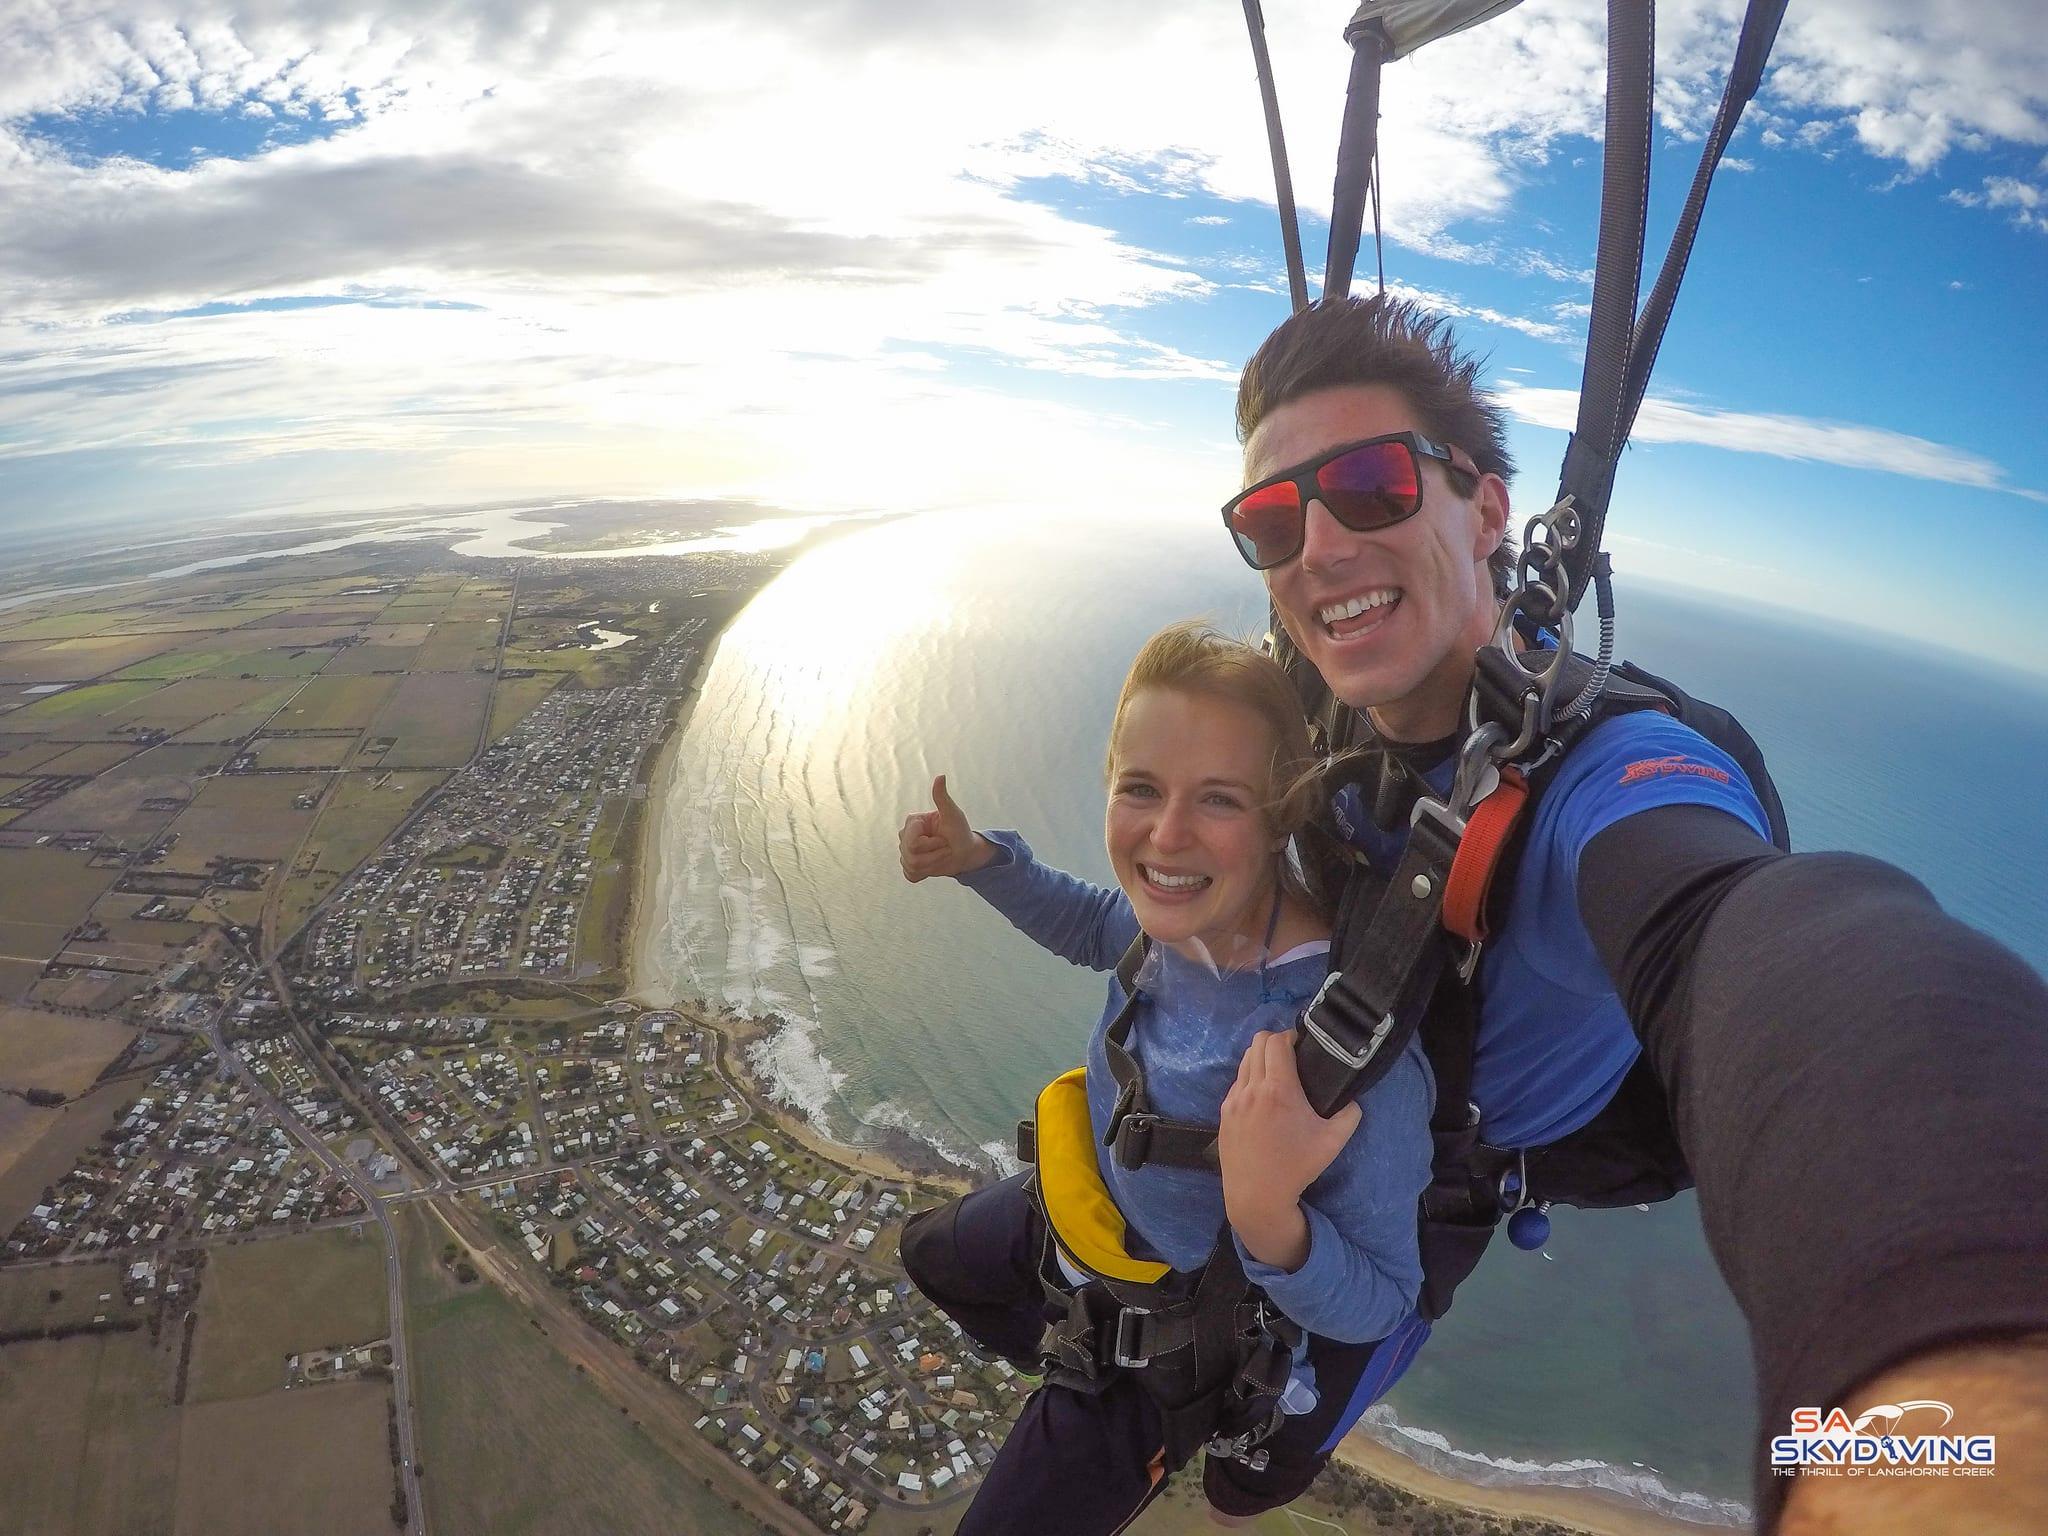 Skydiving Goolwa Basham Beach (Adelaide) - Tandem Skydive 12,000ft